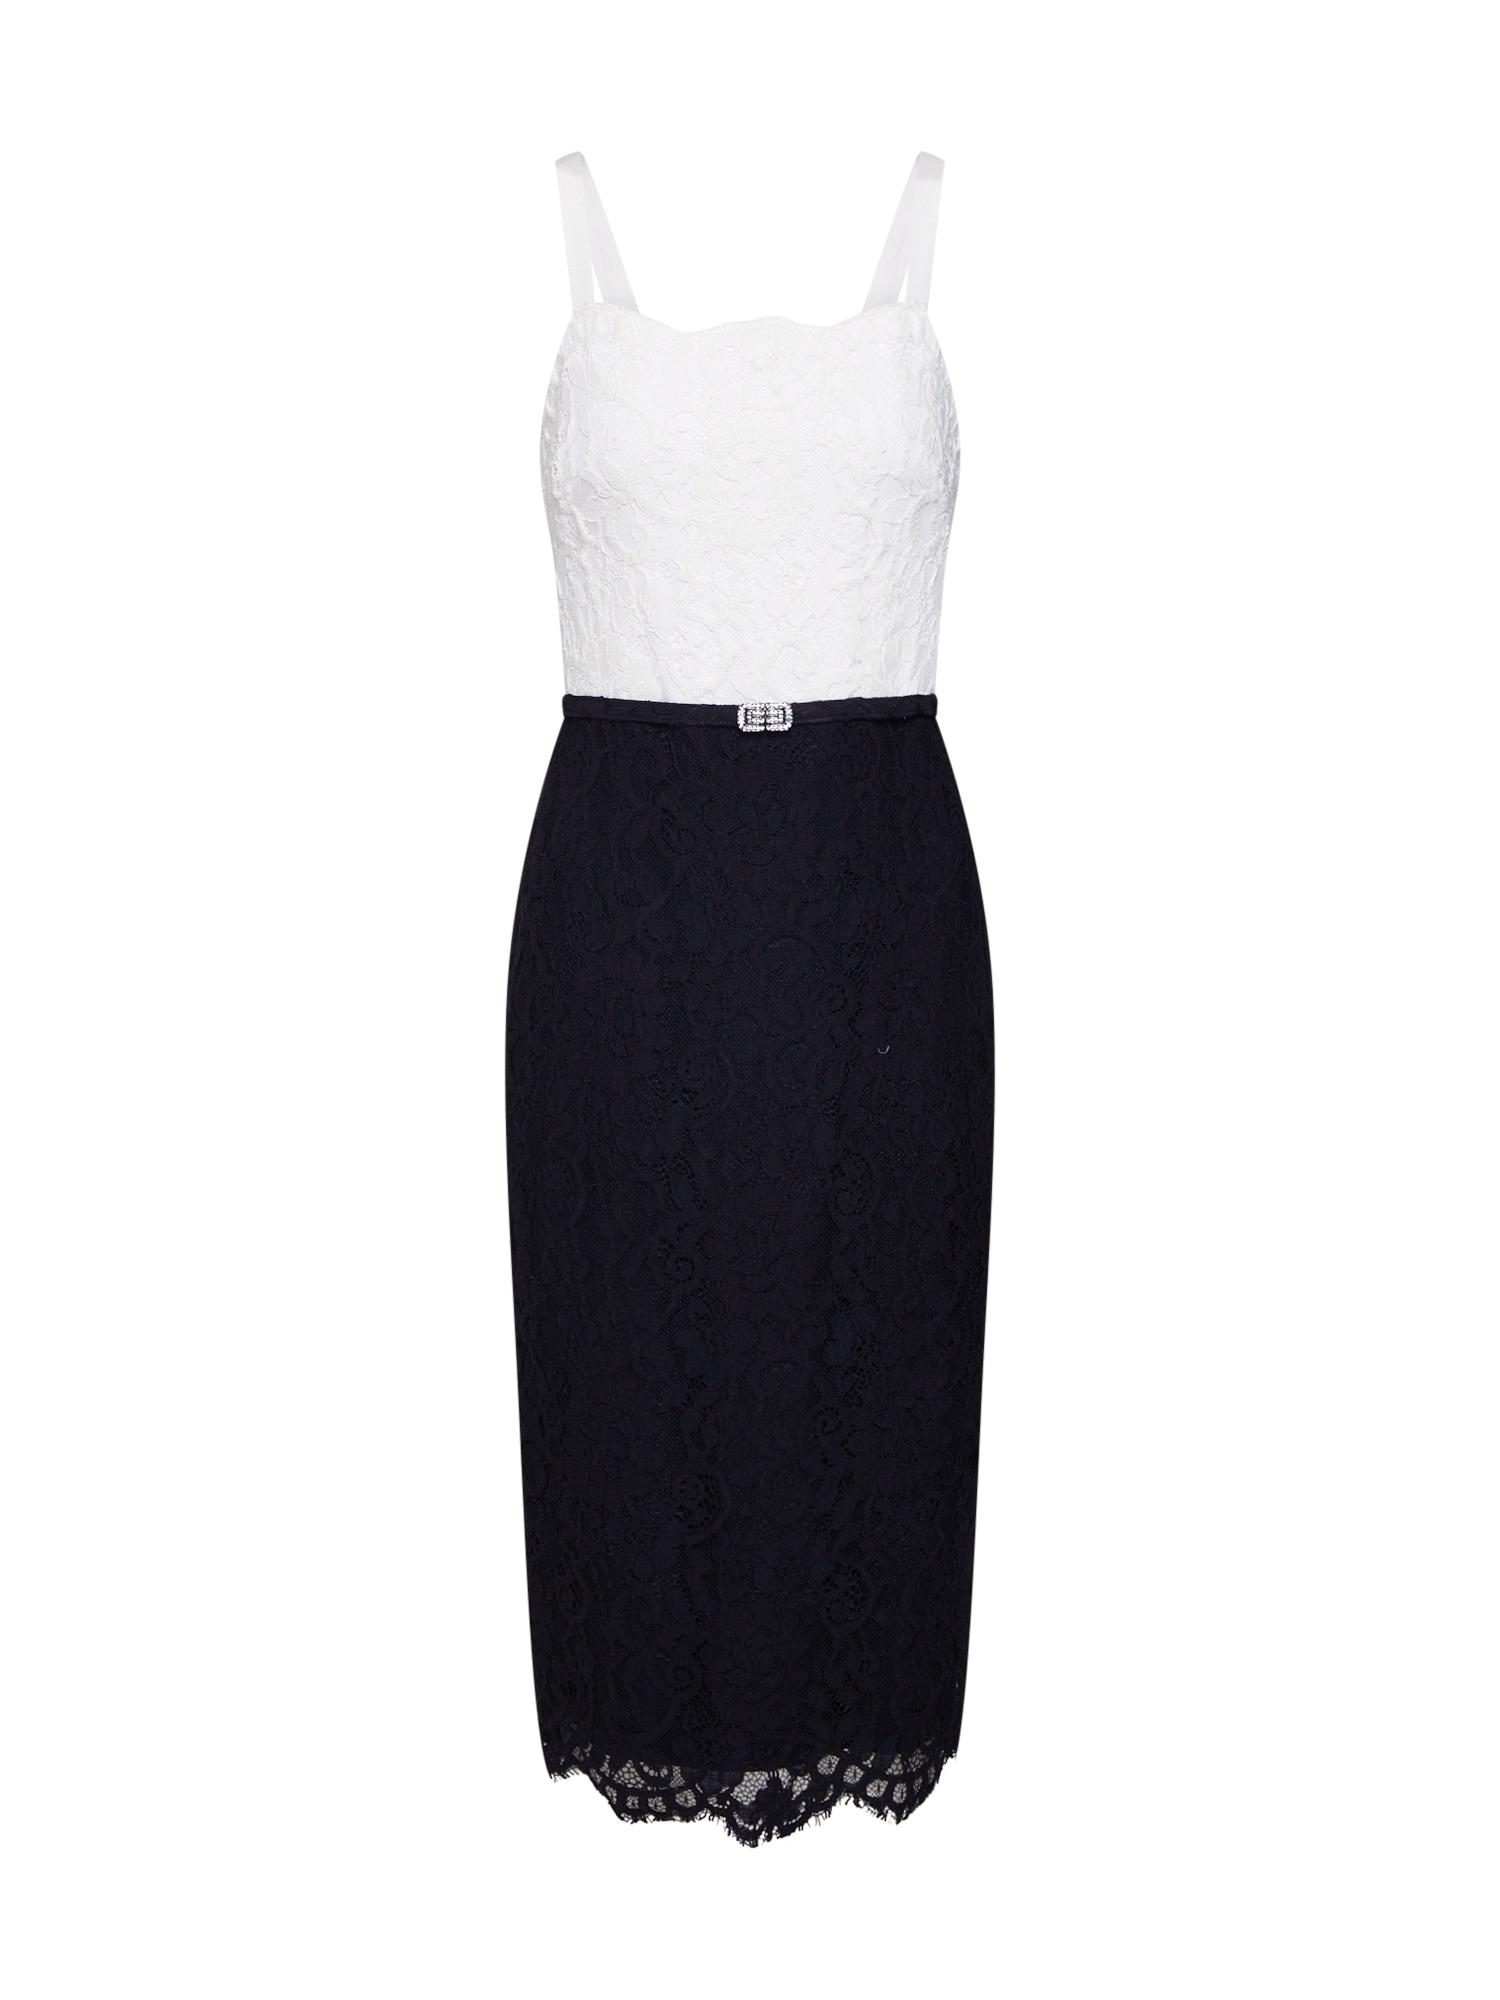 Pouzdrové šaty MAI černá bílá Lauren Ralph Lauren